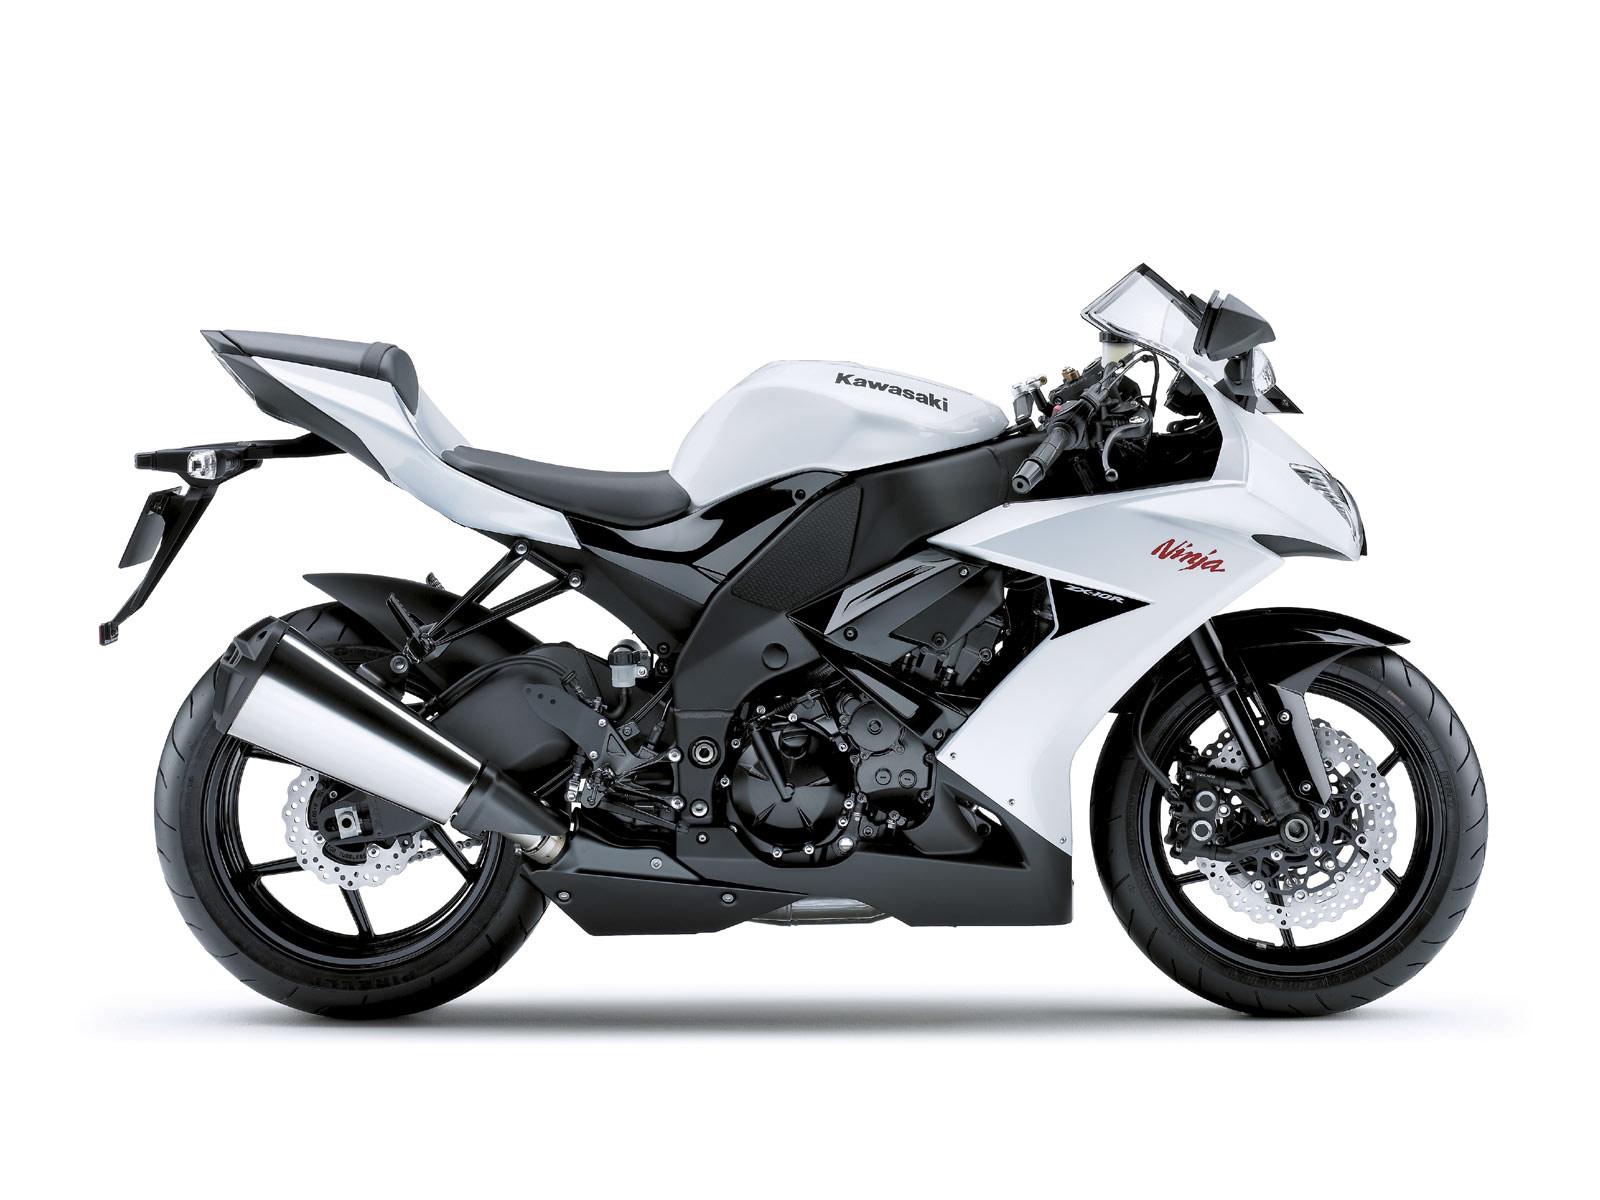 Download Image Gambar Motor Kawasaki Ninja Cc PC Roid IPhone And